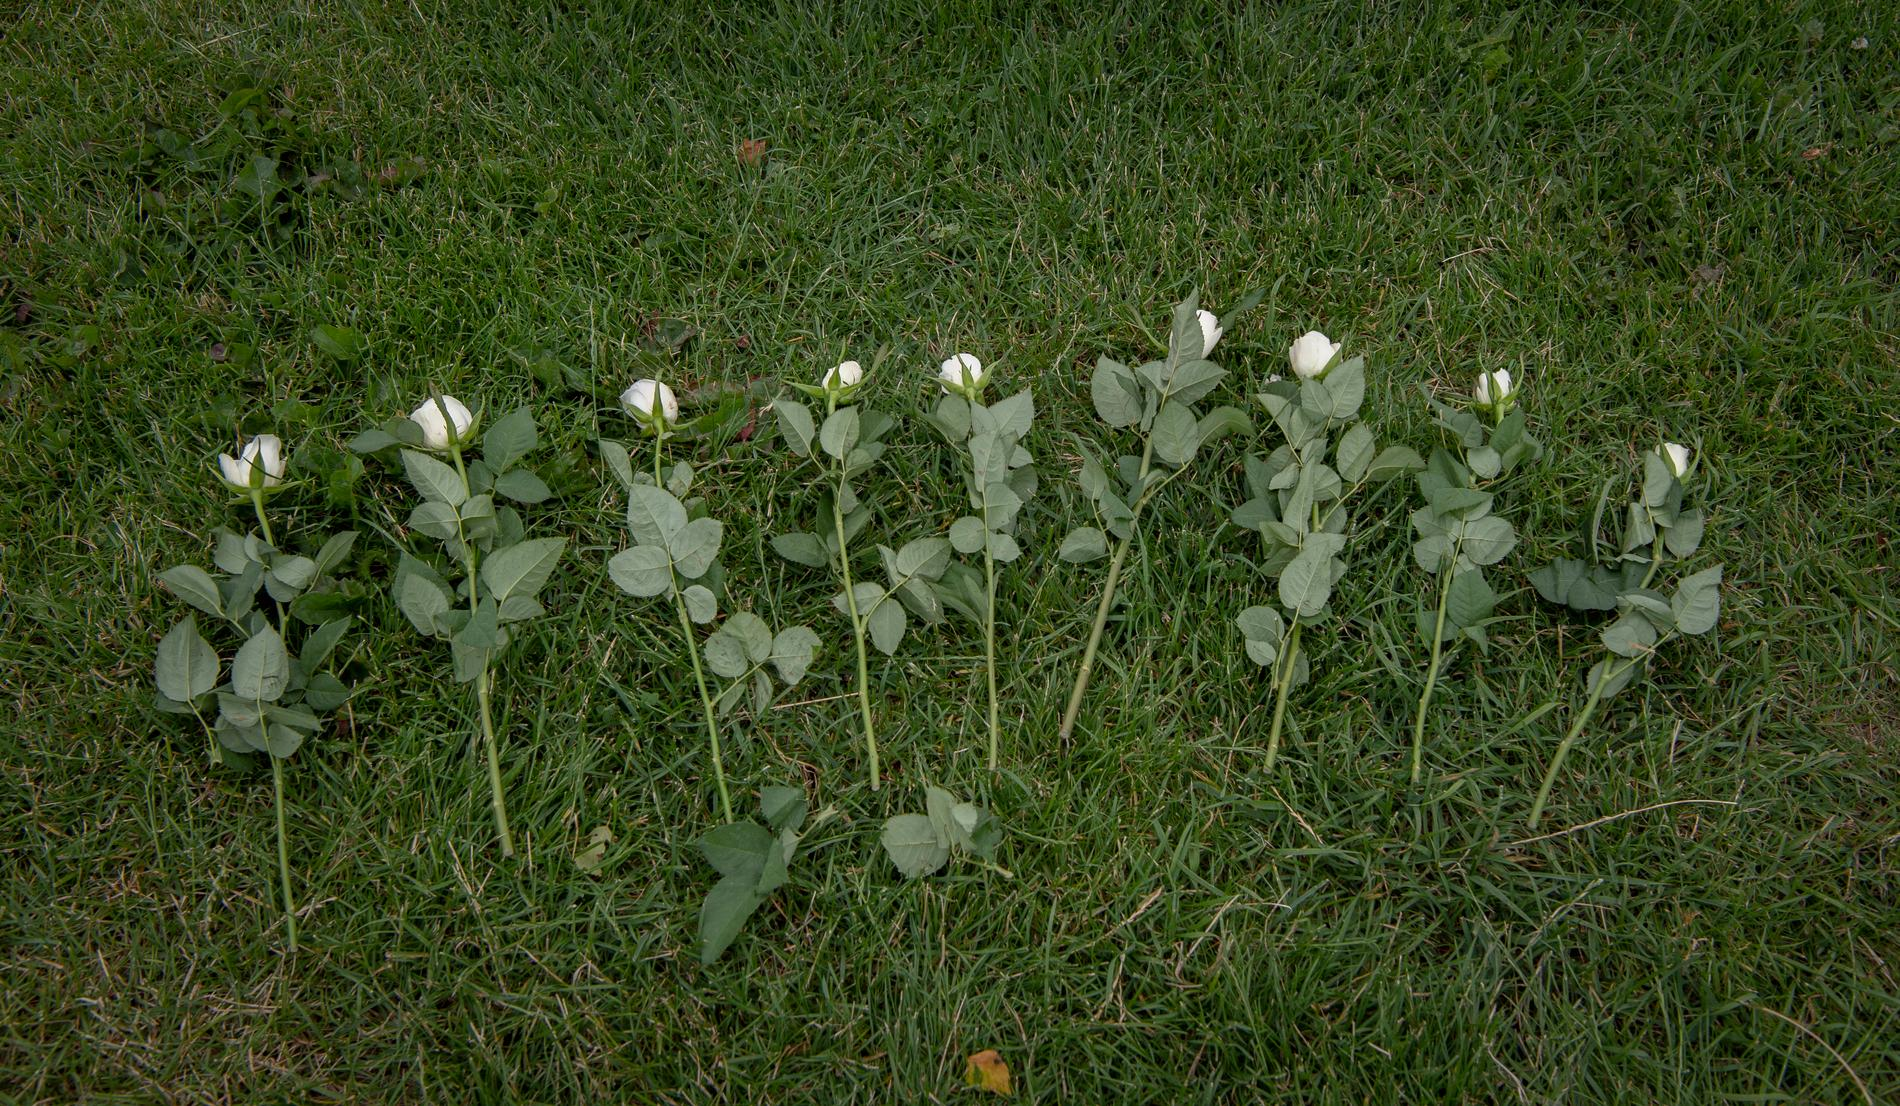 Nio vita rosor – en för varje död person.